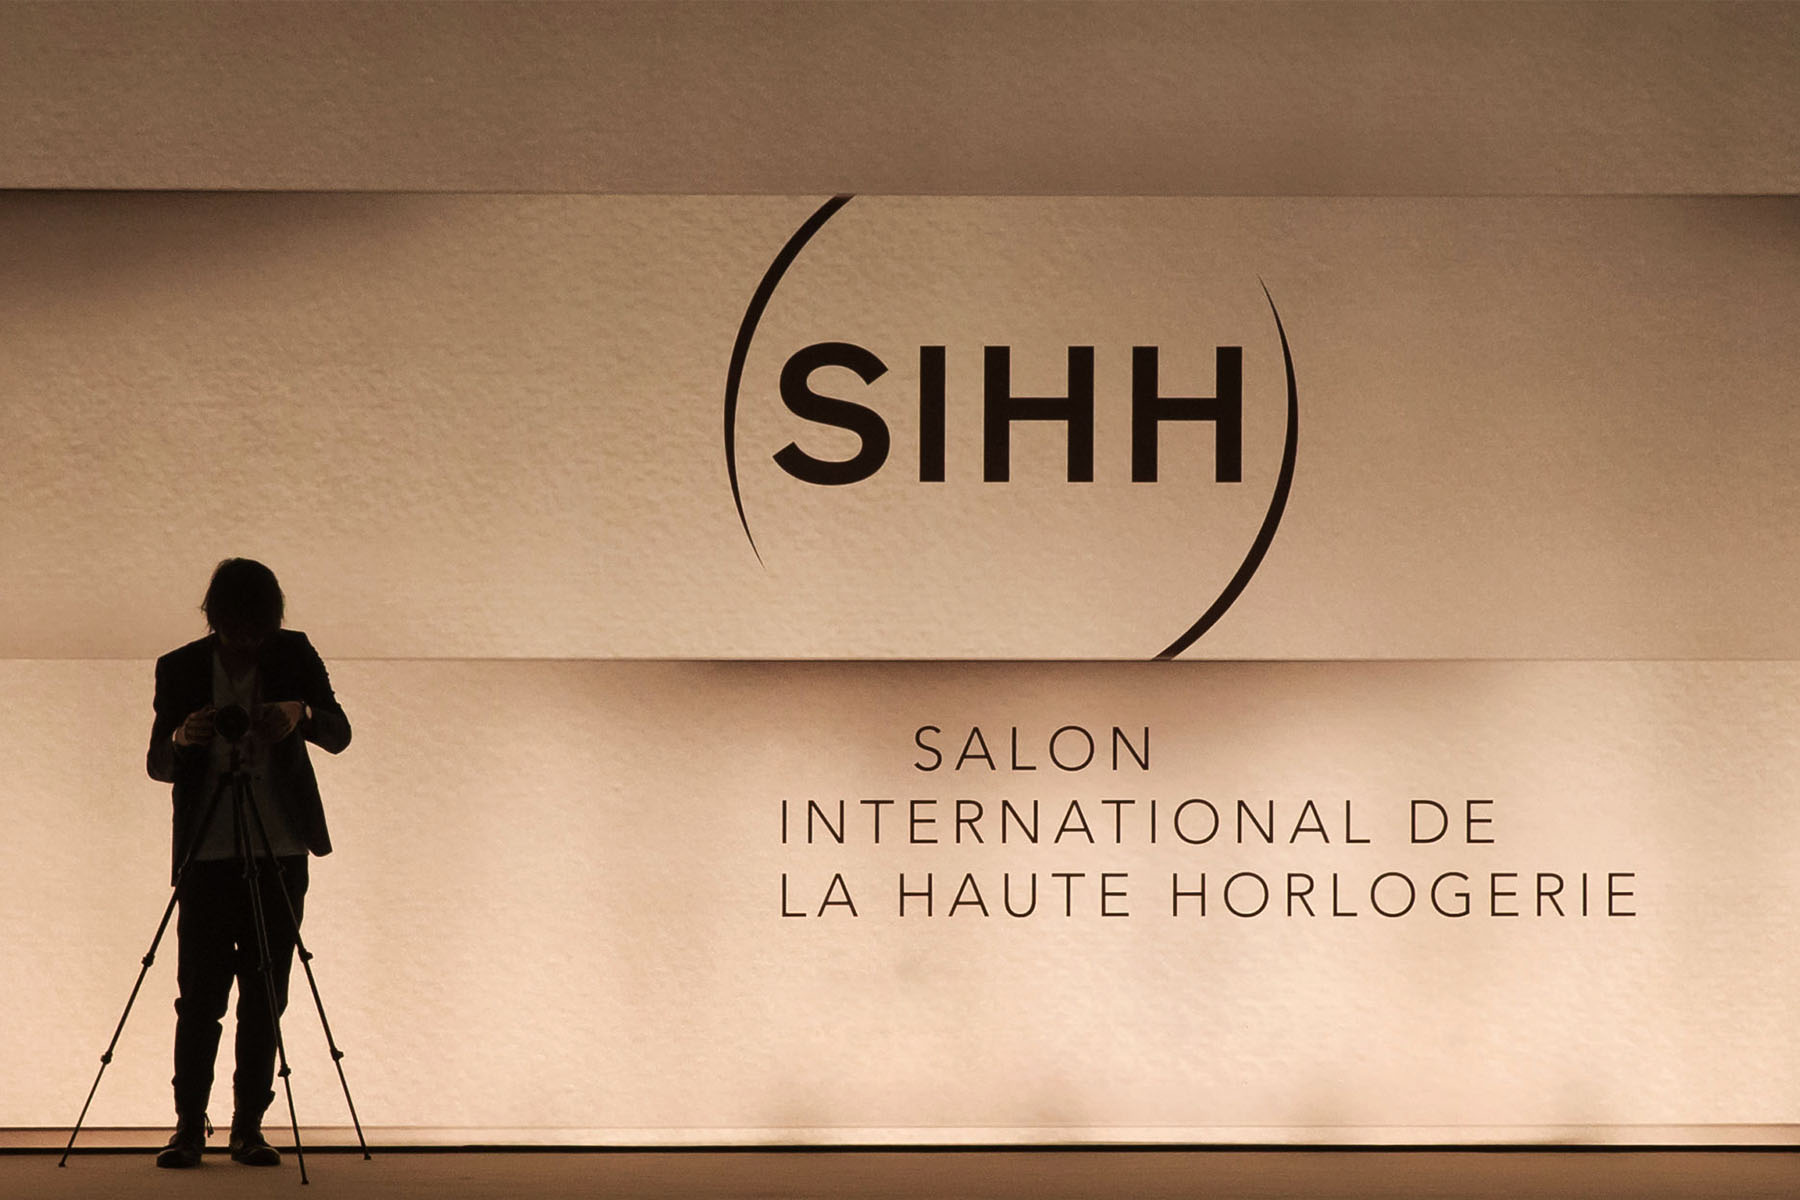 SIHH 2018 program